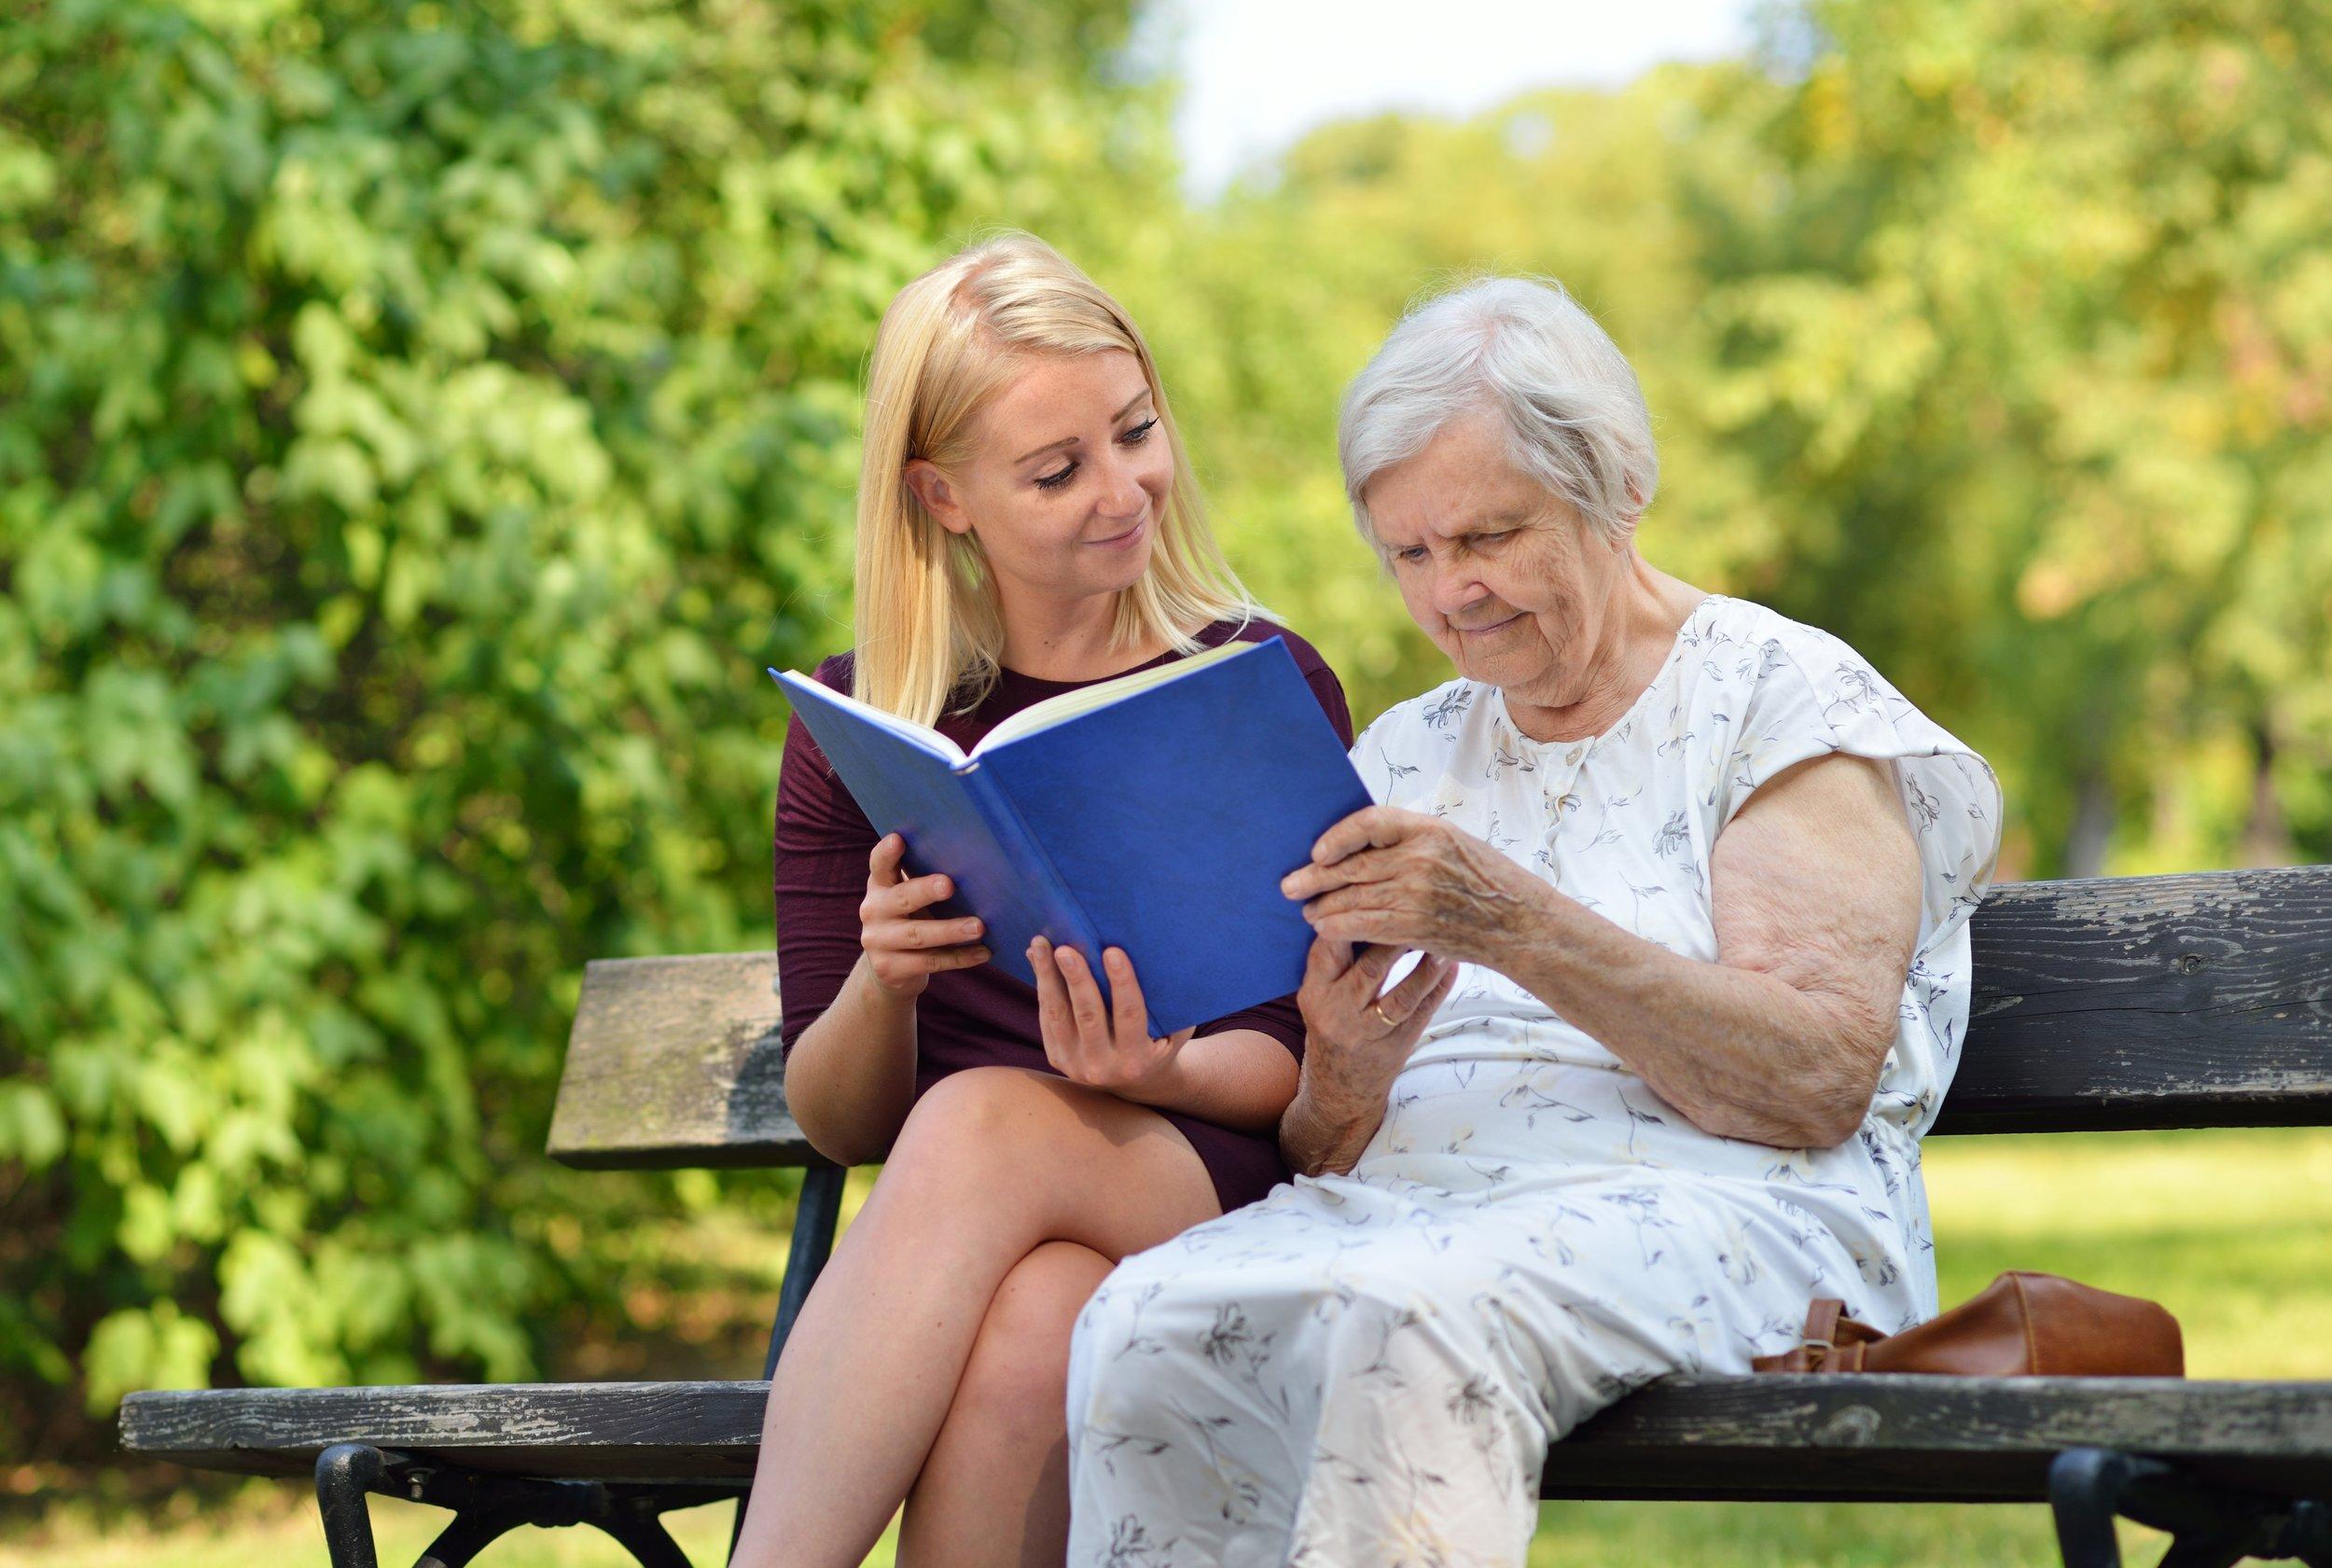 woman and elderly woman.jpeg